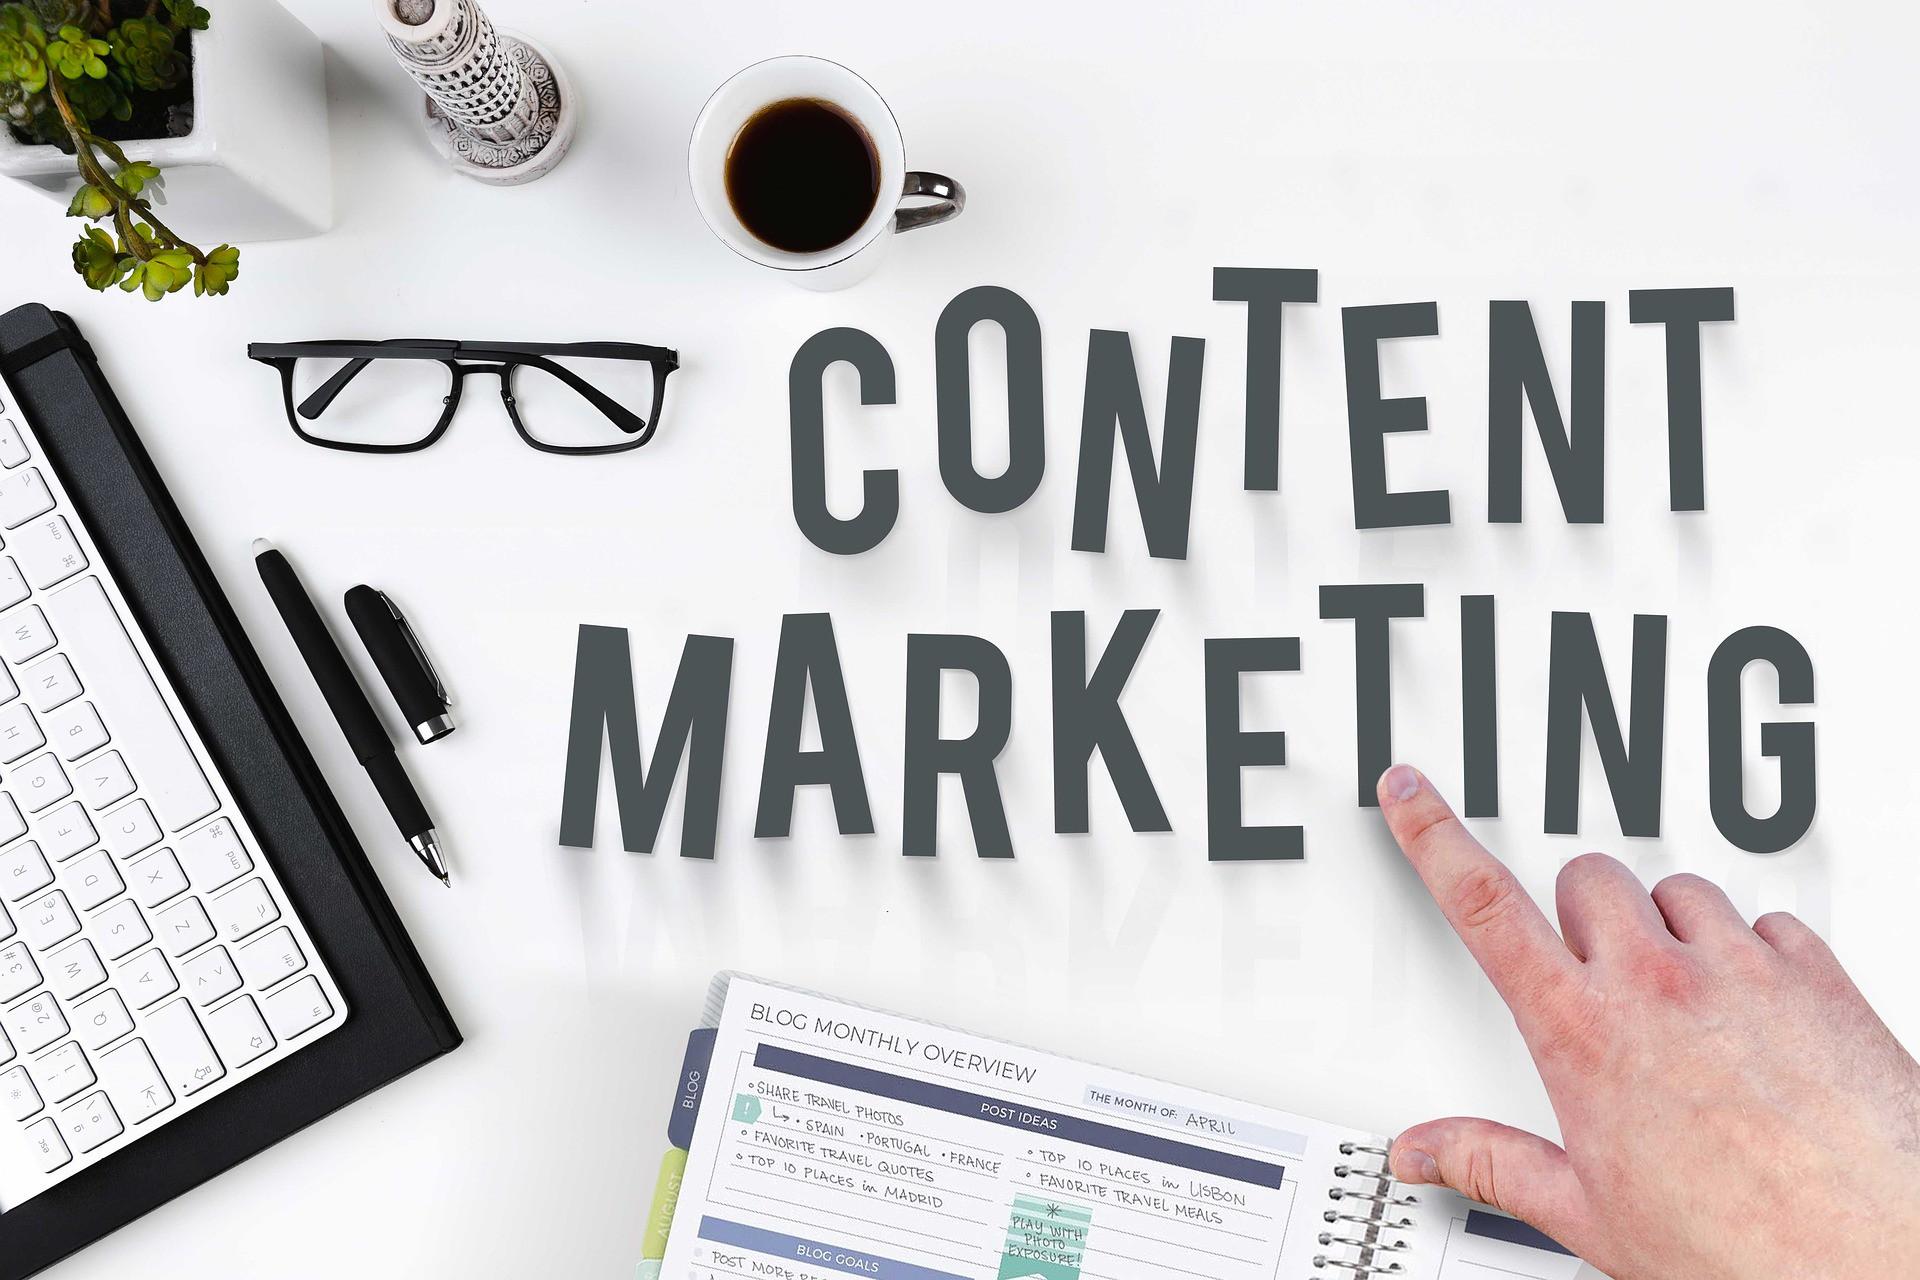 Wat is content marketing?